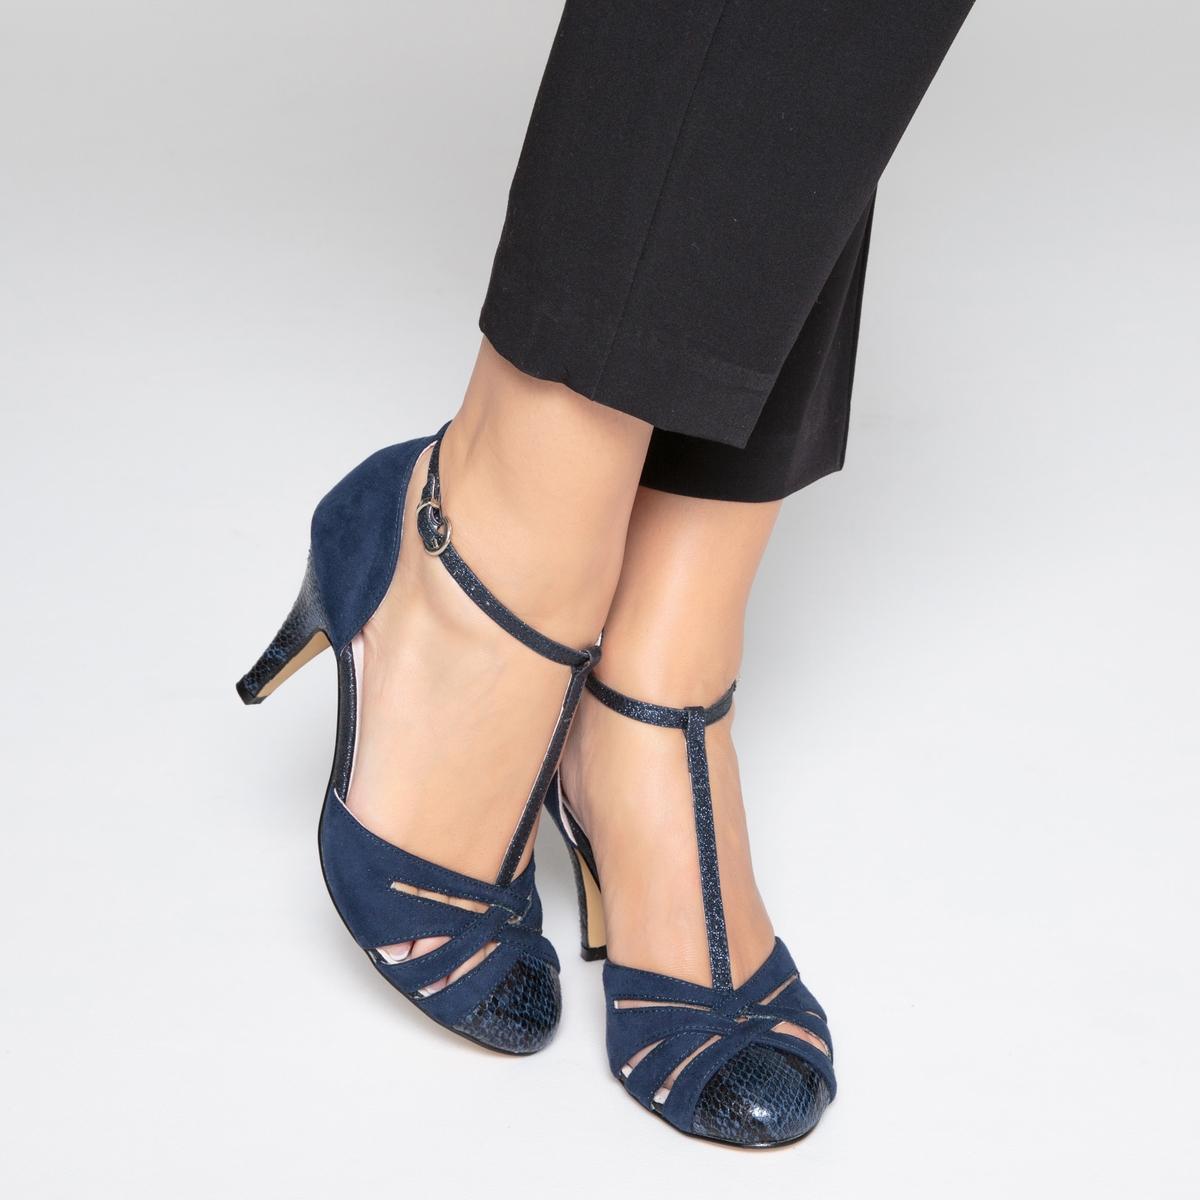 Сандалии на каблуке под кожу питона ботинки дерби под кожу питона